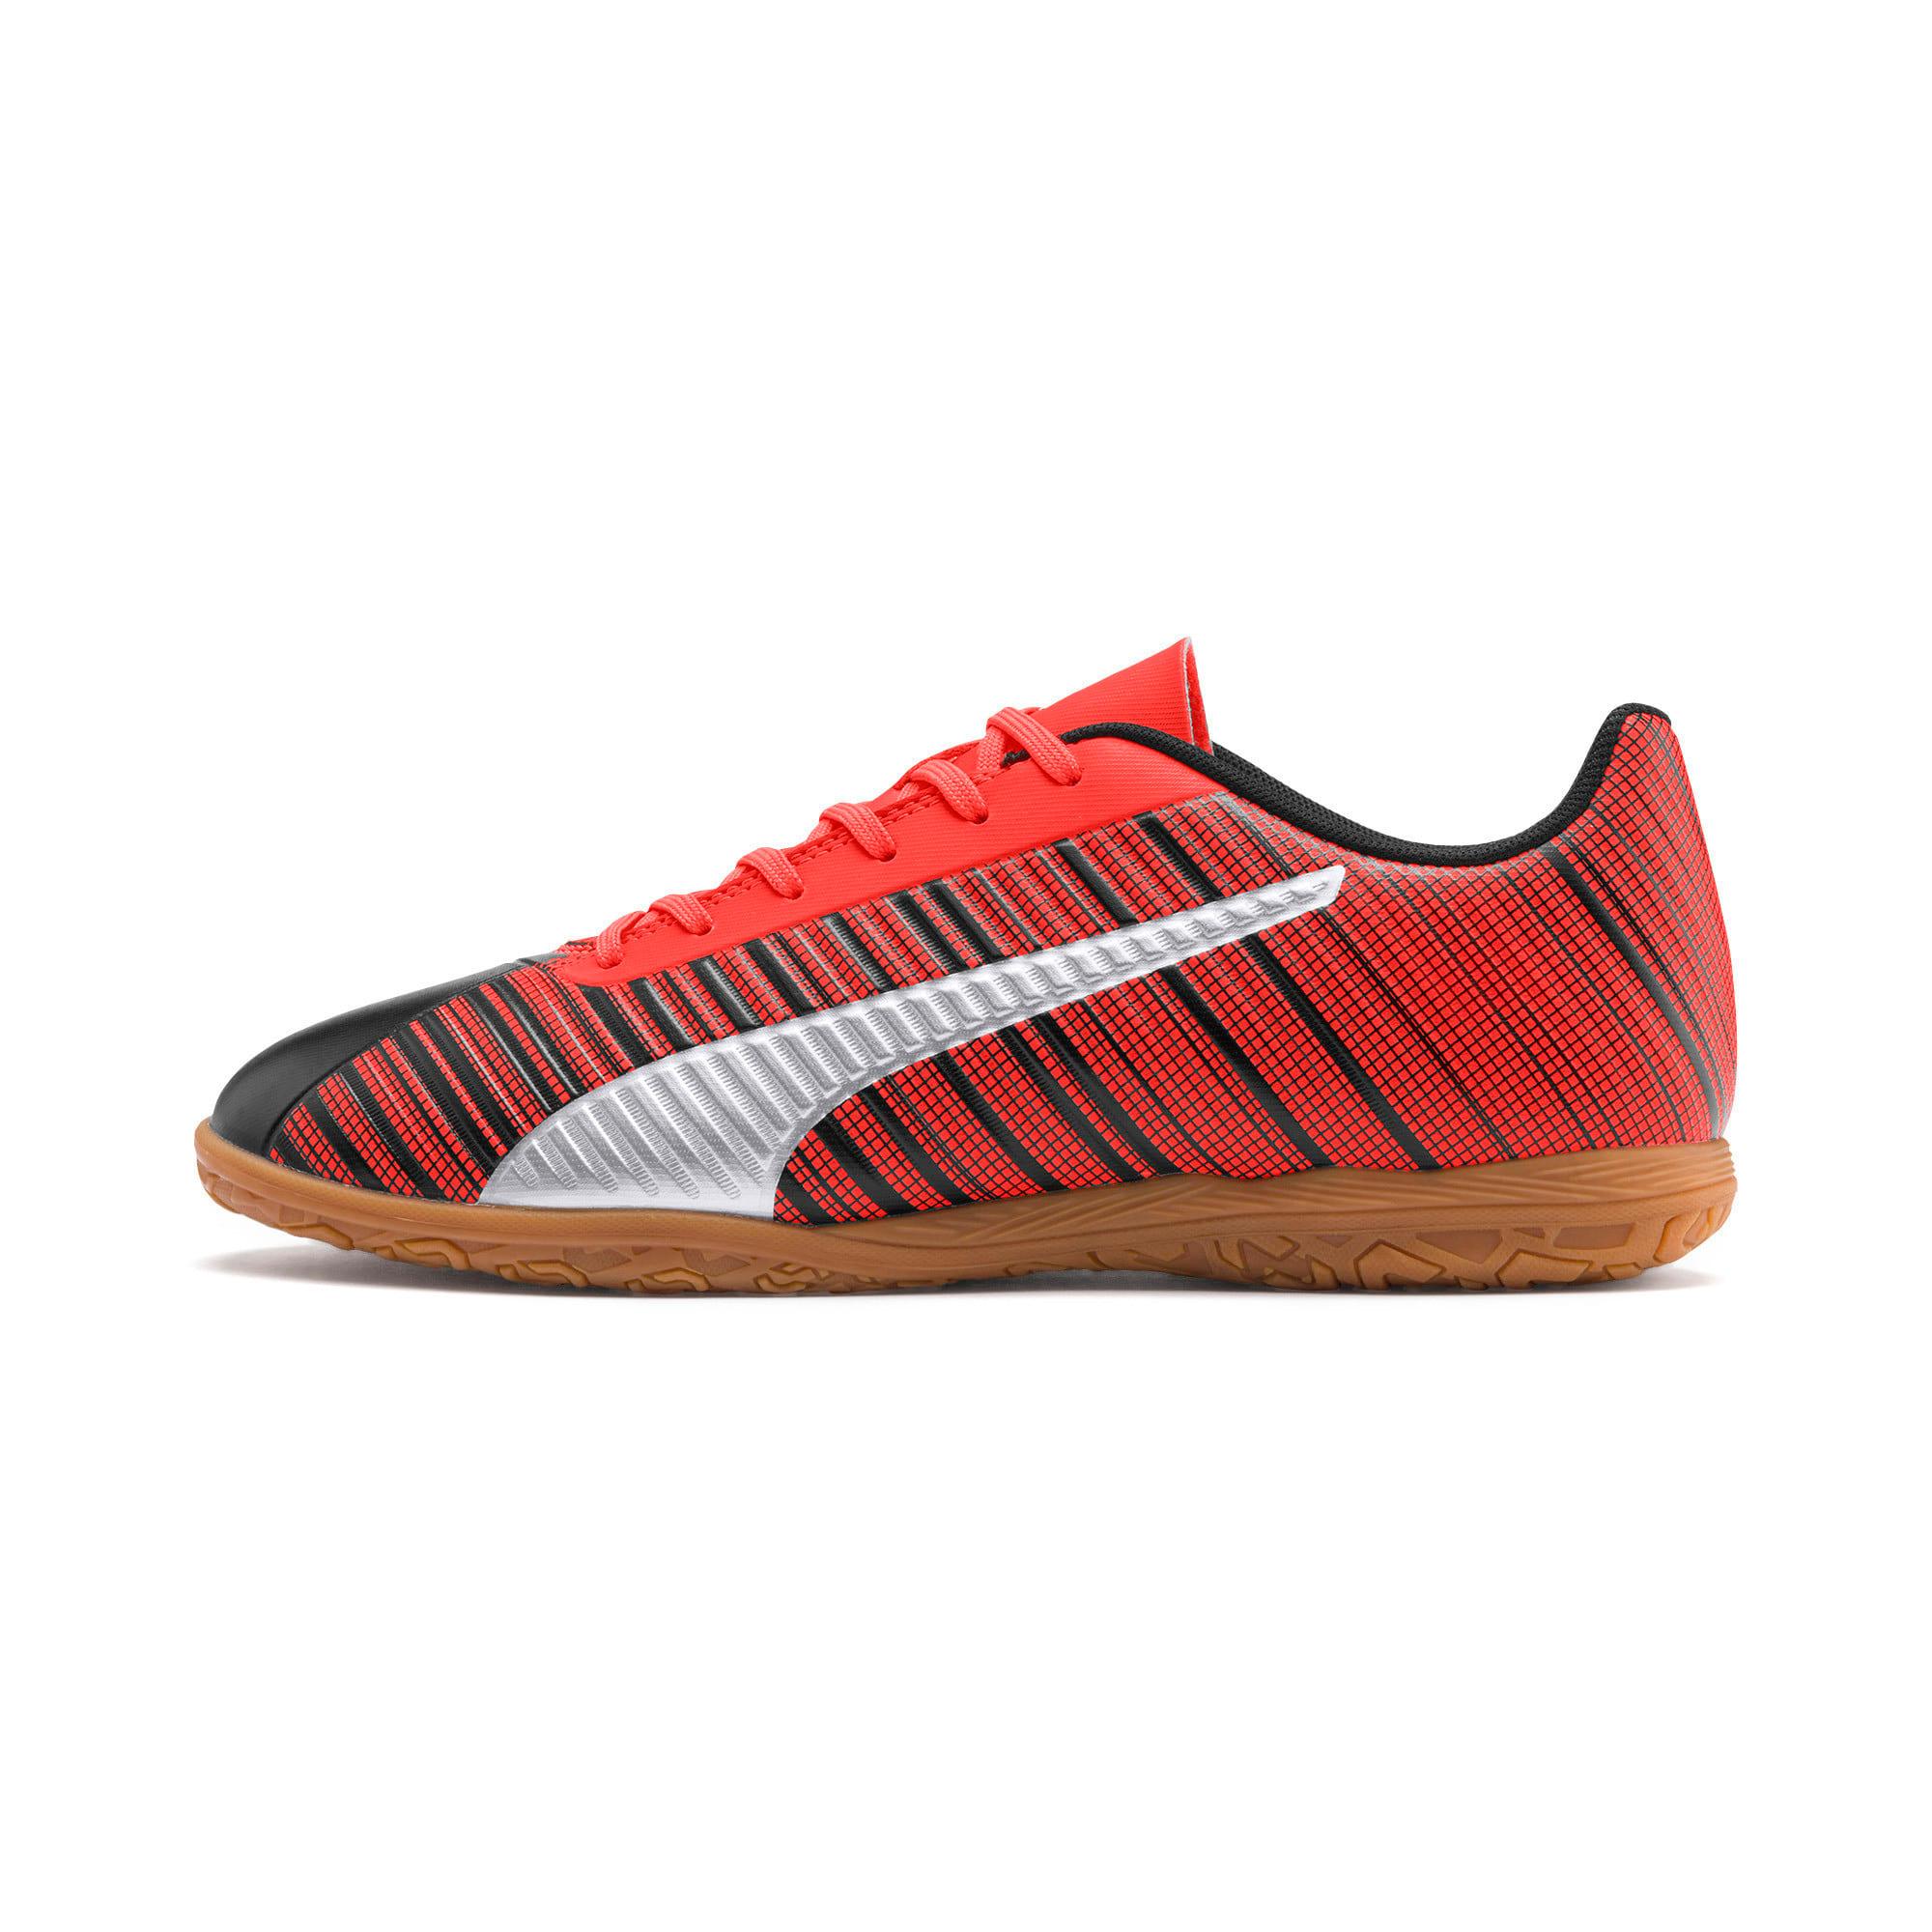 Thumbnail 1 of PUMA ONE 5.4 IT Men's Soccer Shoes, Black-Red-Silver-Gum, medium